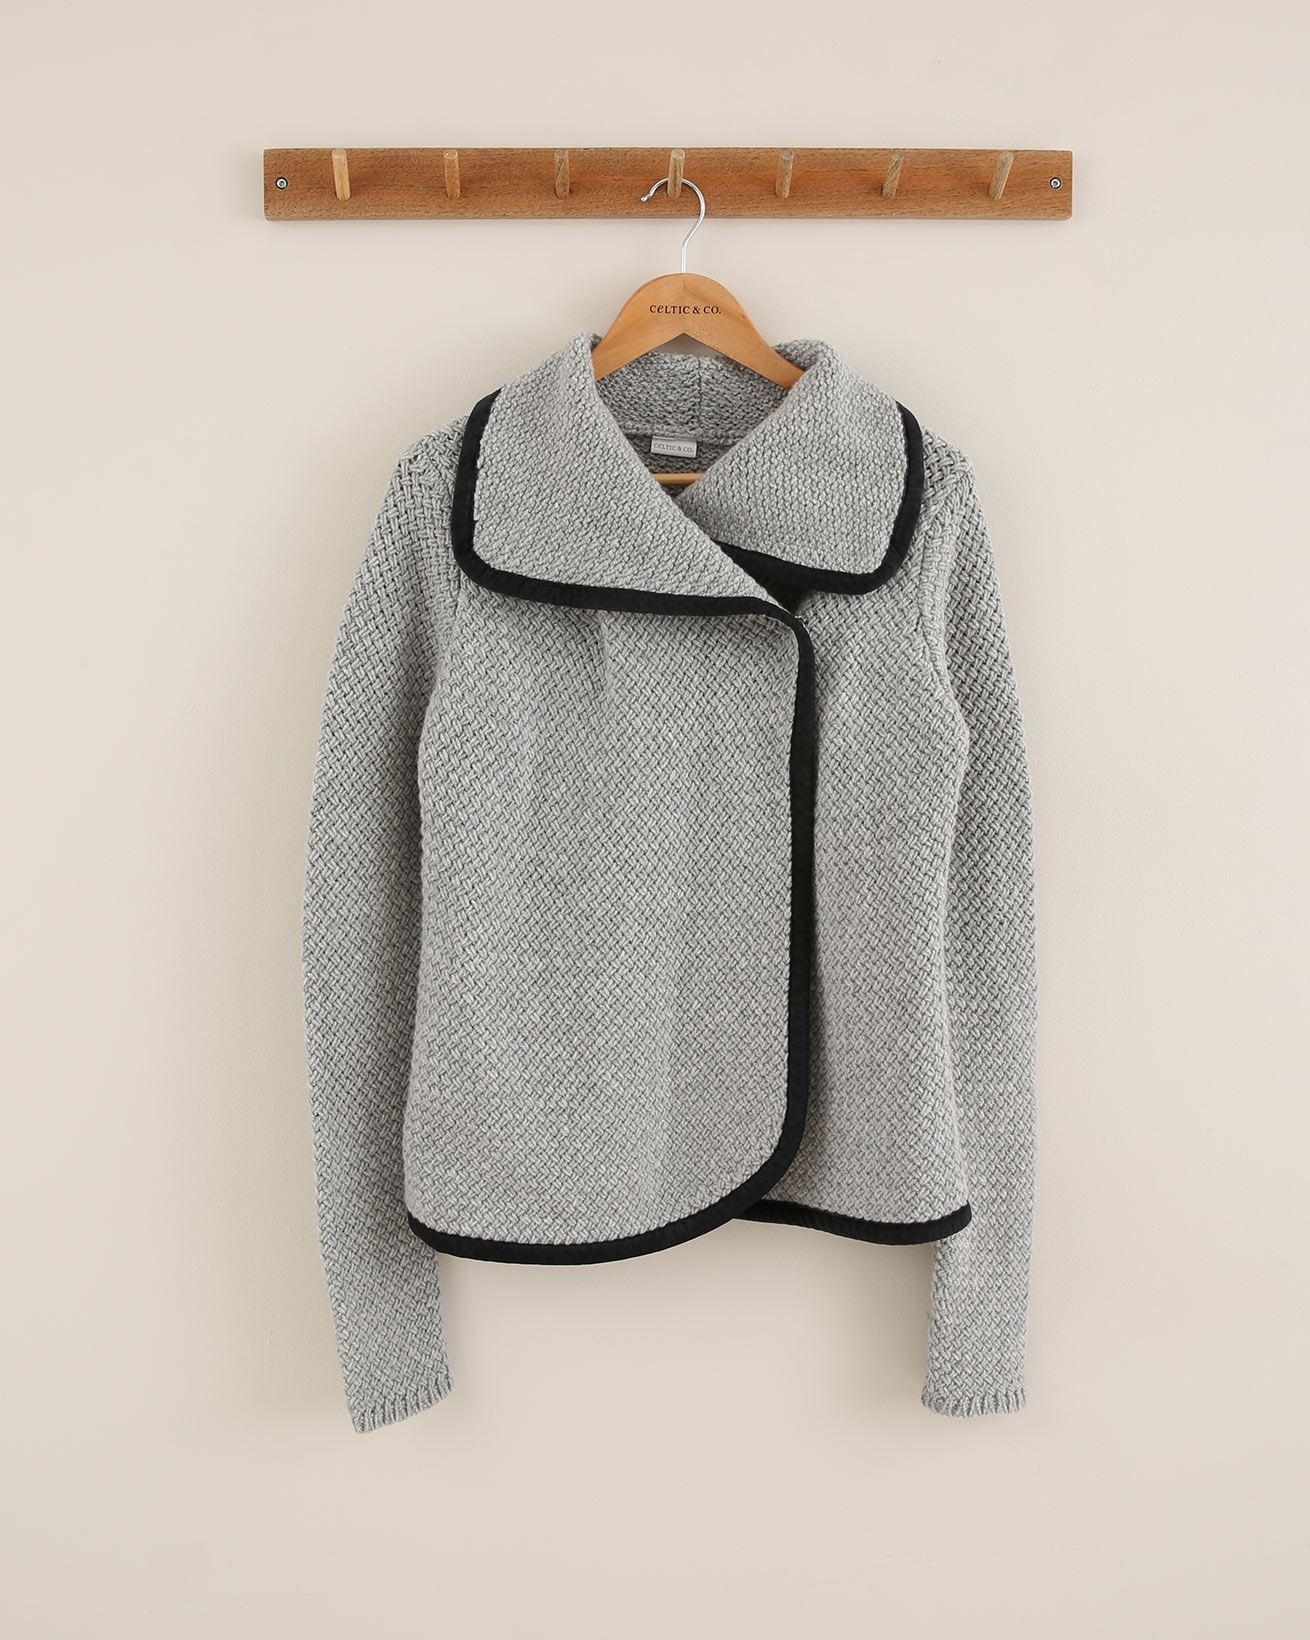 Stitch Detail Leather Trim Coatigan - Size Small - Silver Grey/Black - 1781